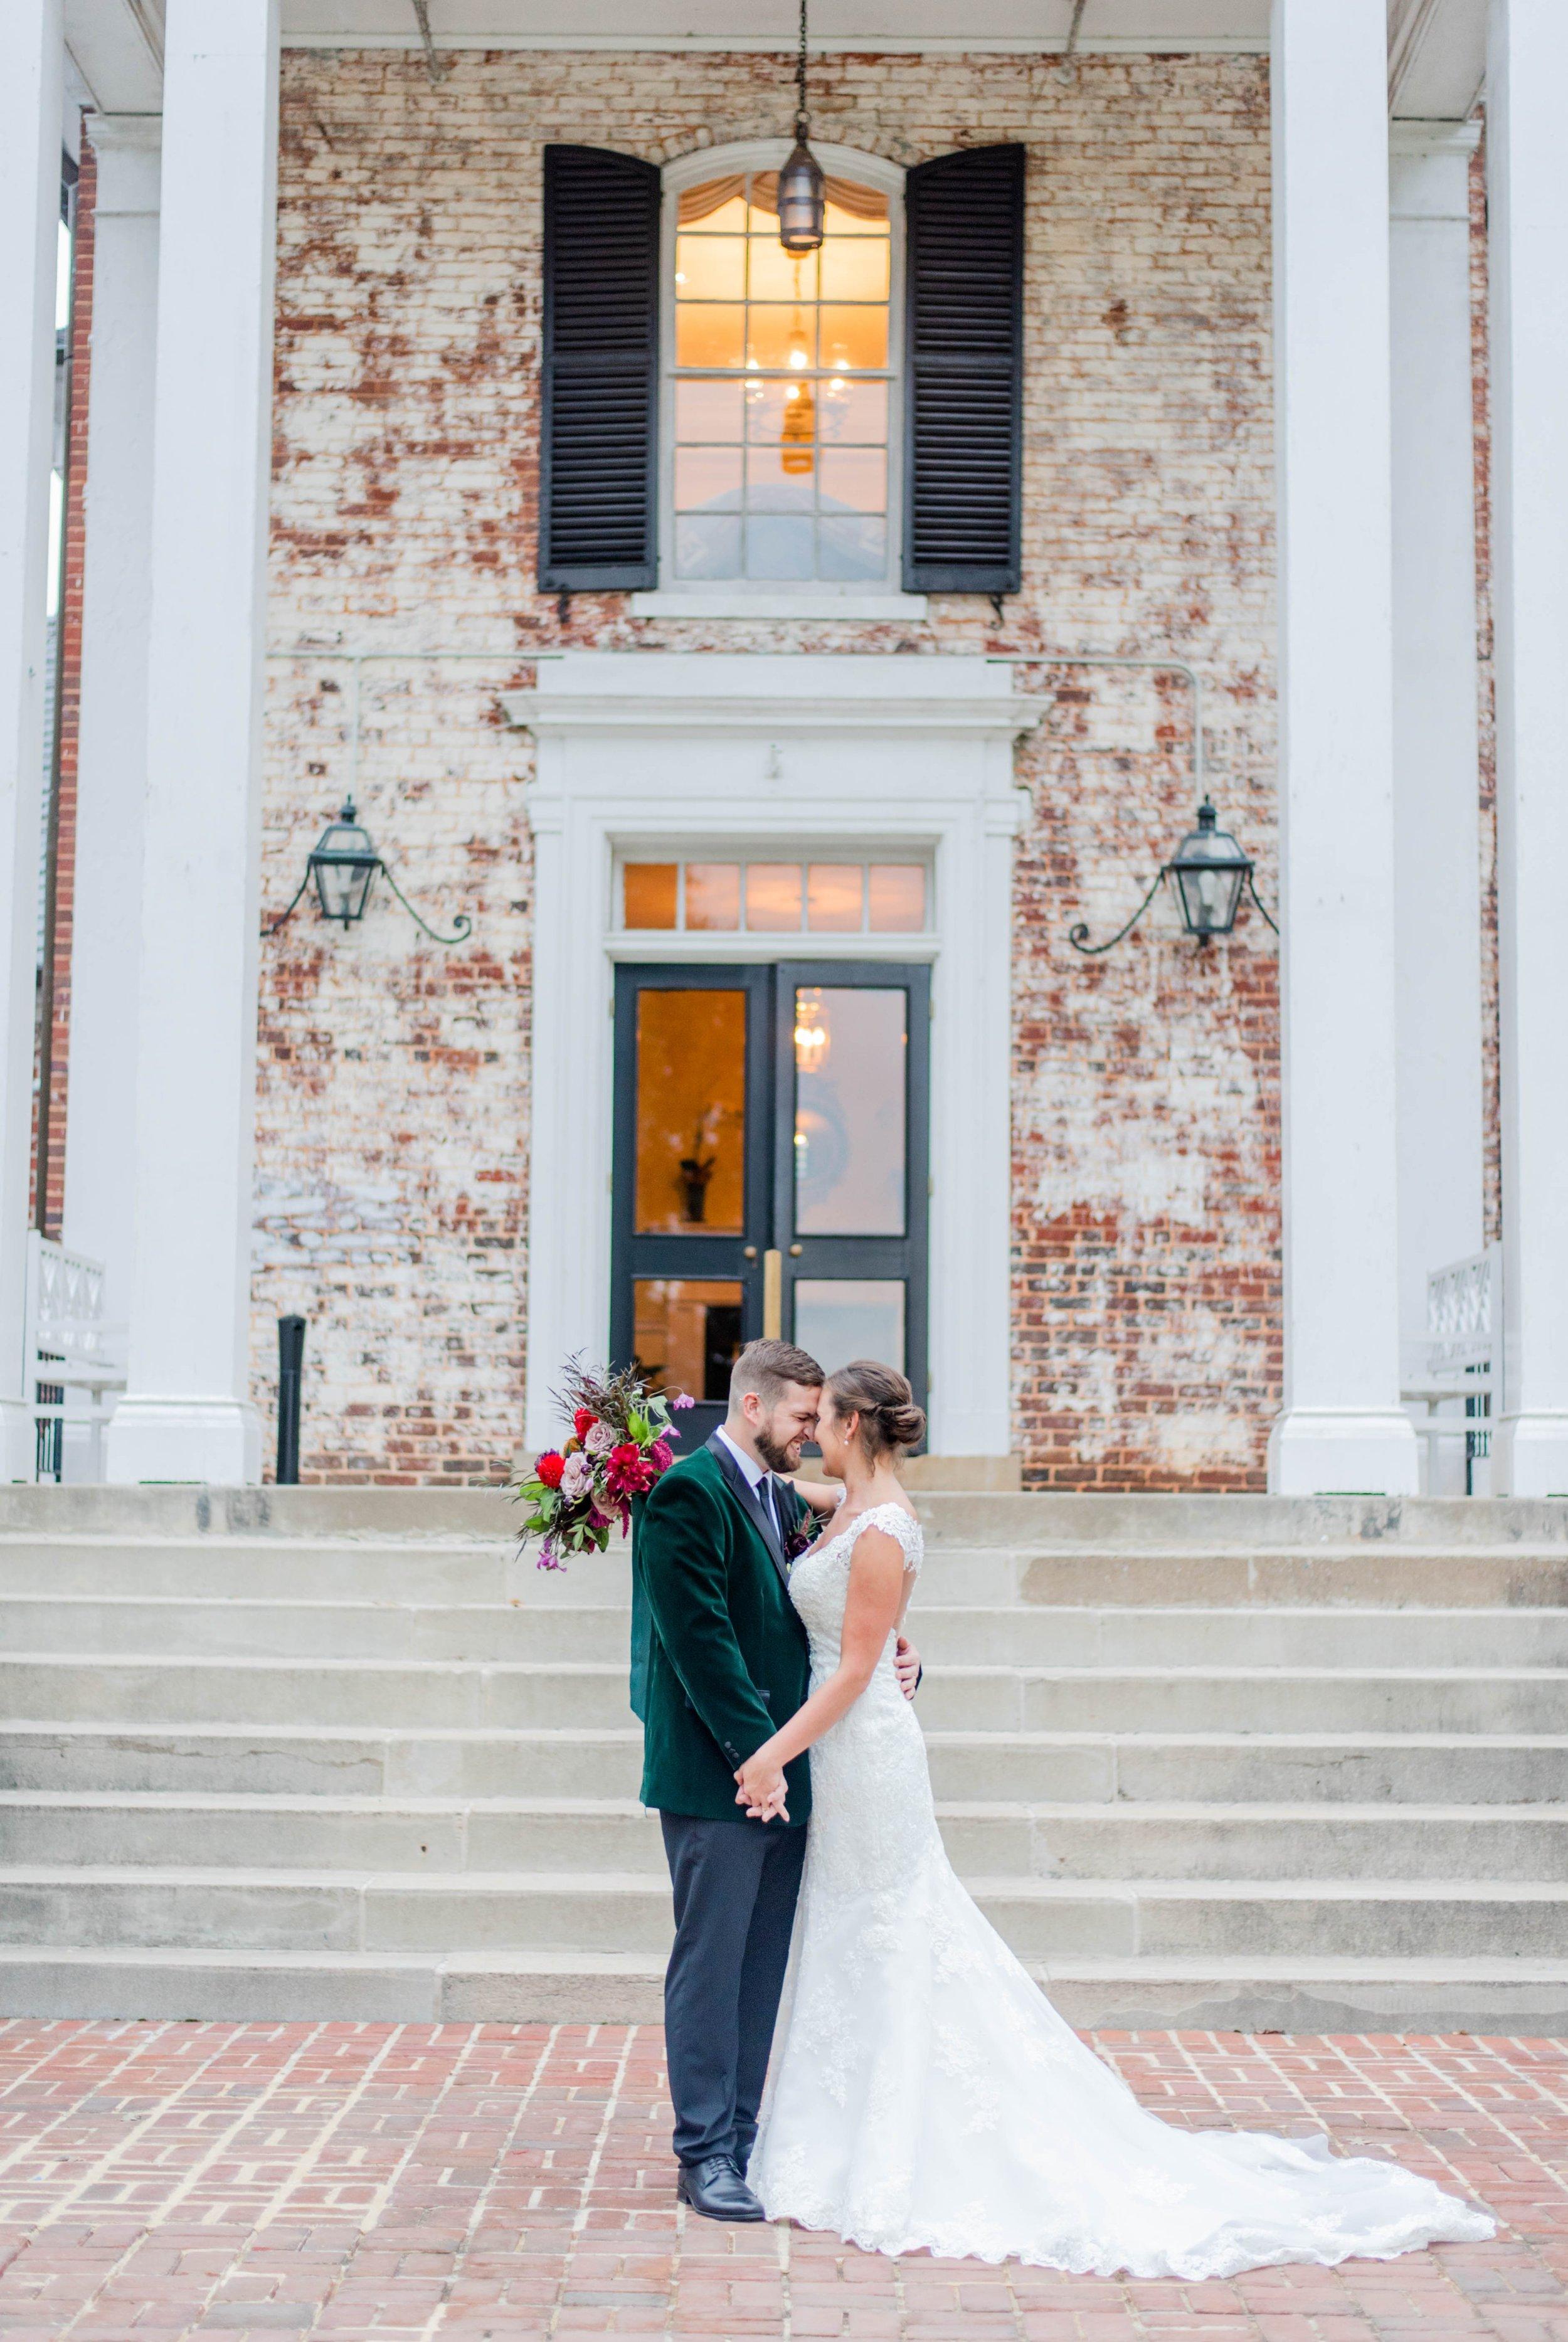 Gordan+Lauren_BoonsboroCountryClubWedding_Virginiaweddingphotographer_LynchburgVi 40.jpg